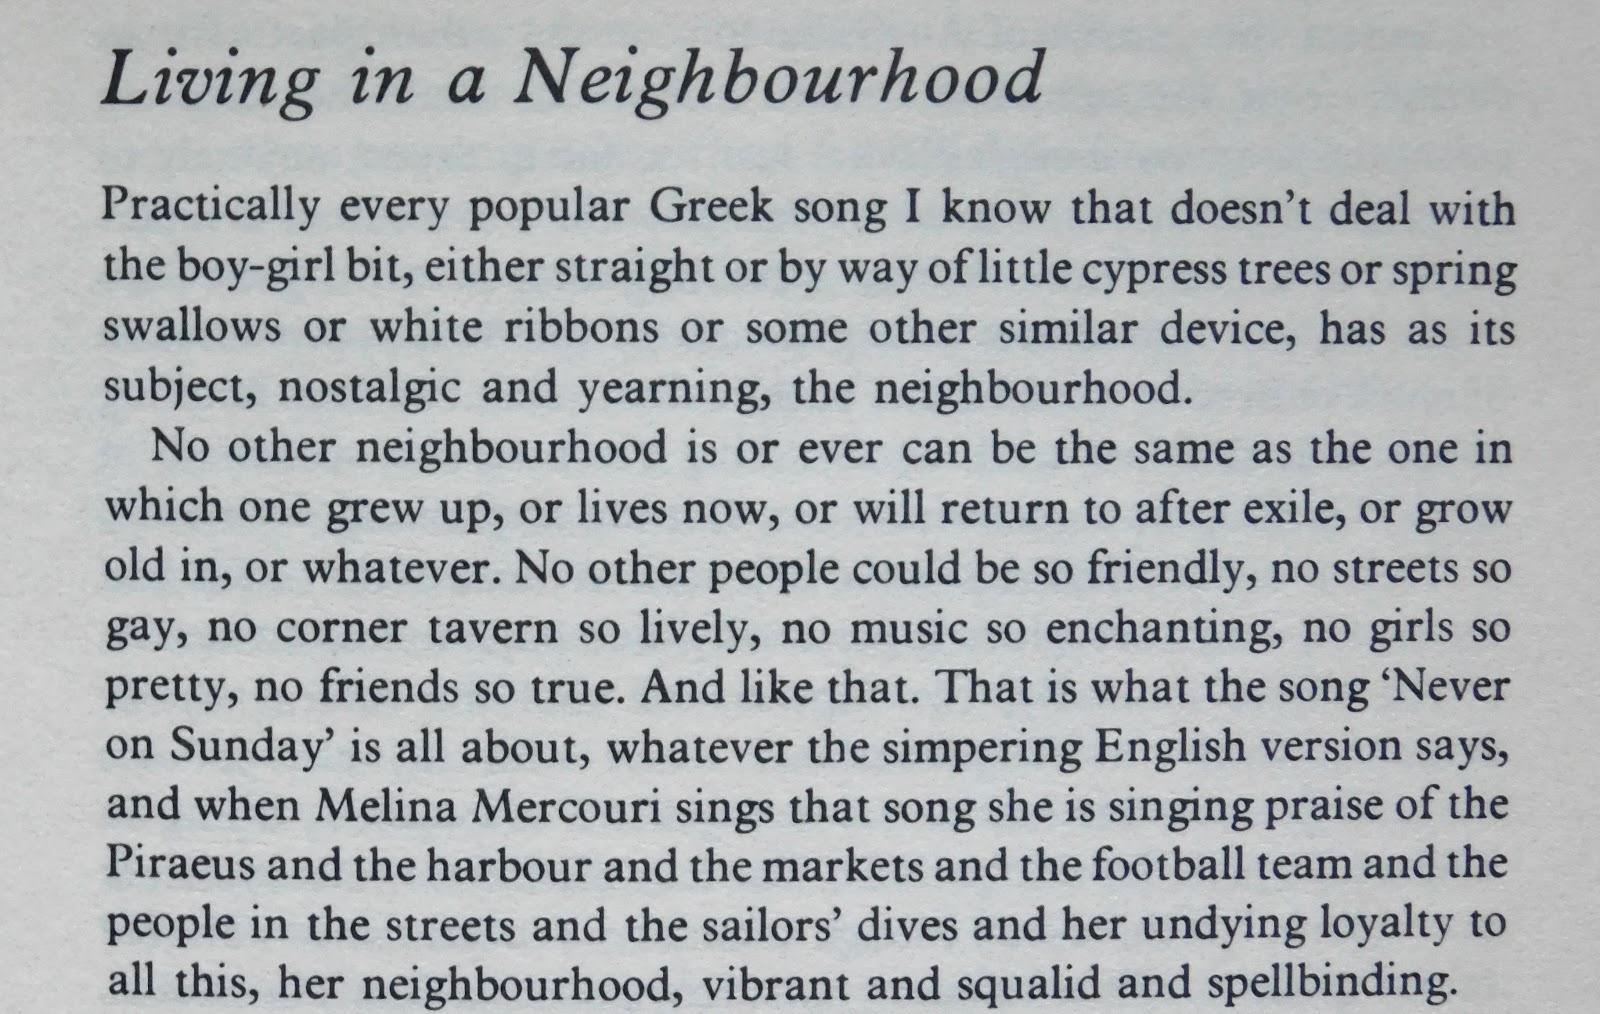 Corfu Blues and Global Views: Charmian Clift on Greek Songs